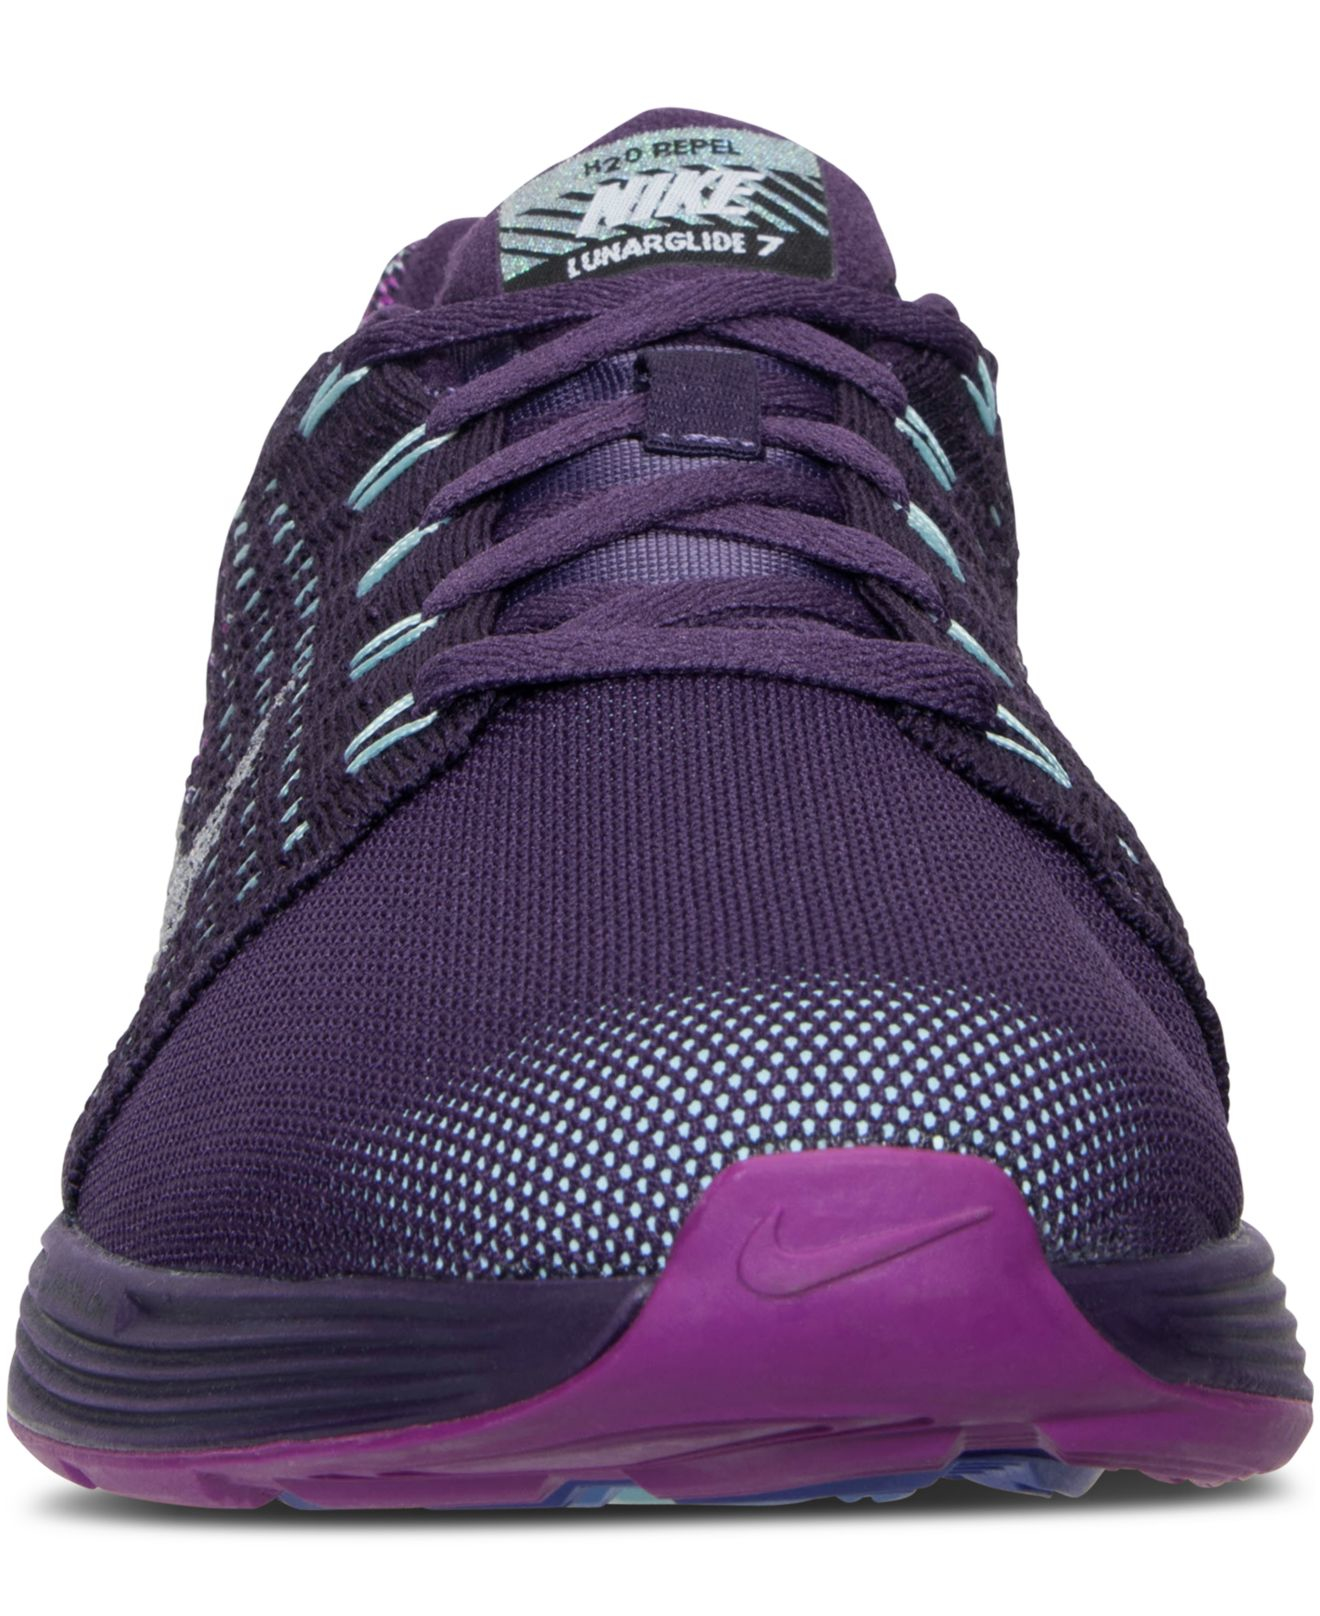 online store e4cf7 e2fd2 clearance nike lunarglide 7 women purple jumpsuits 71126 63d76